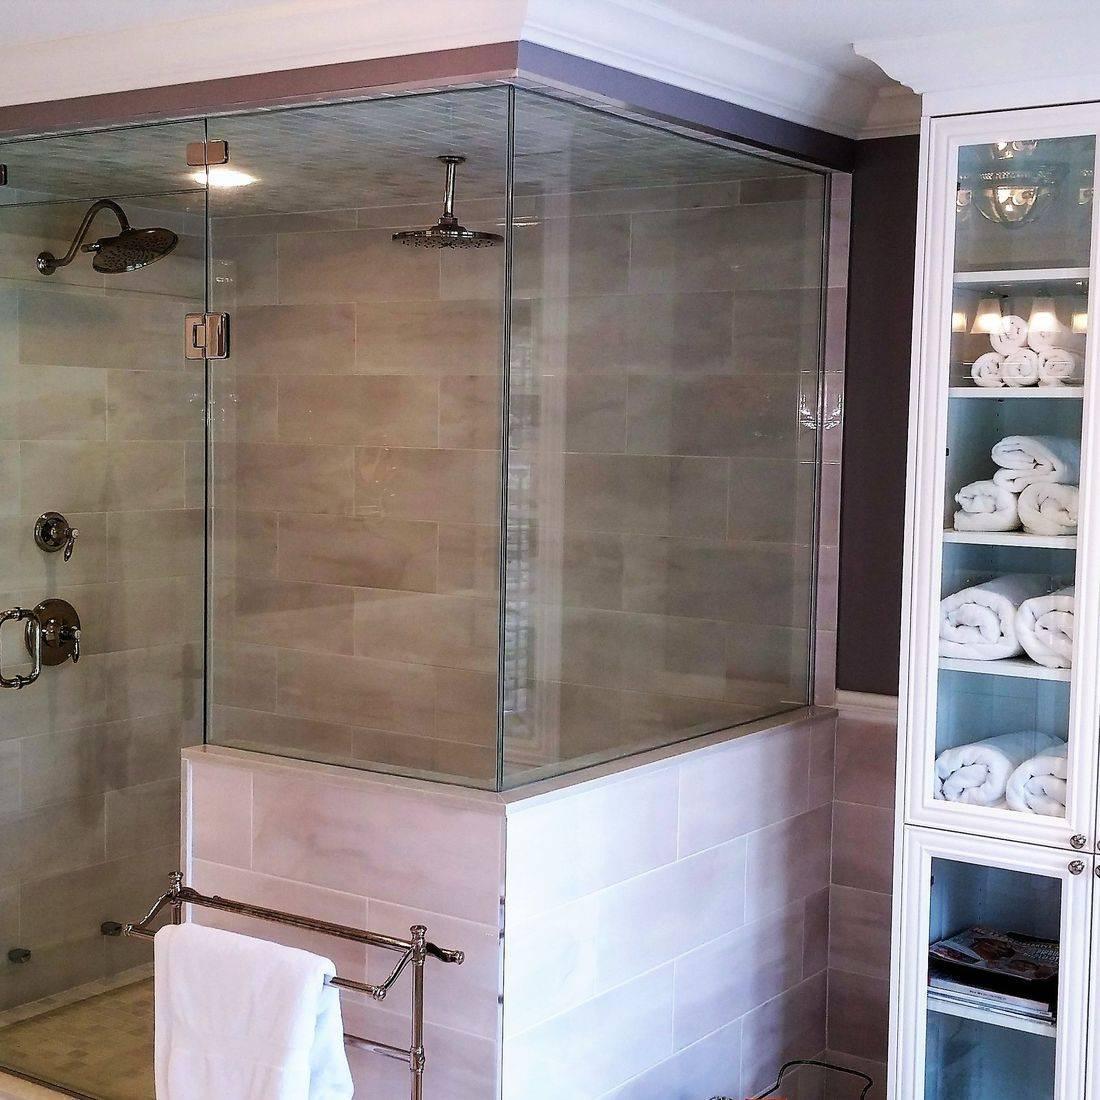 Sibra Kitchens Markham Toronto cabinets bathroom shower